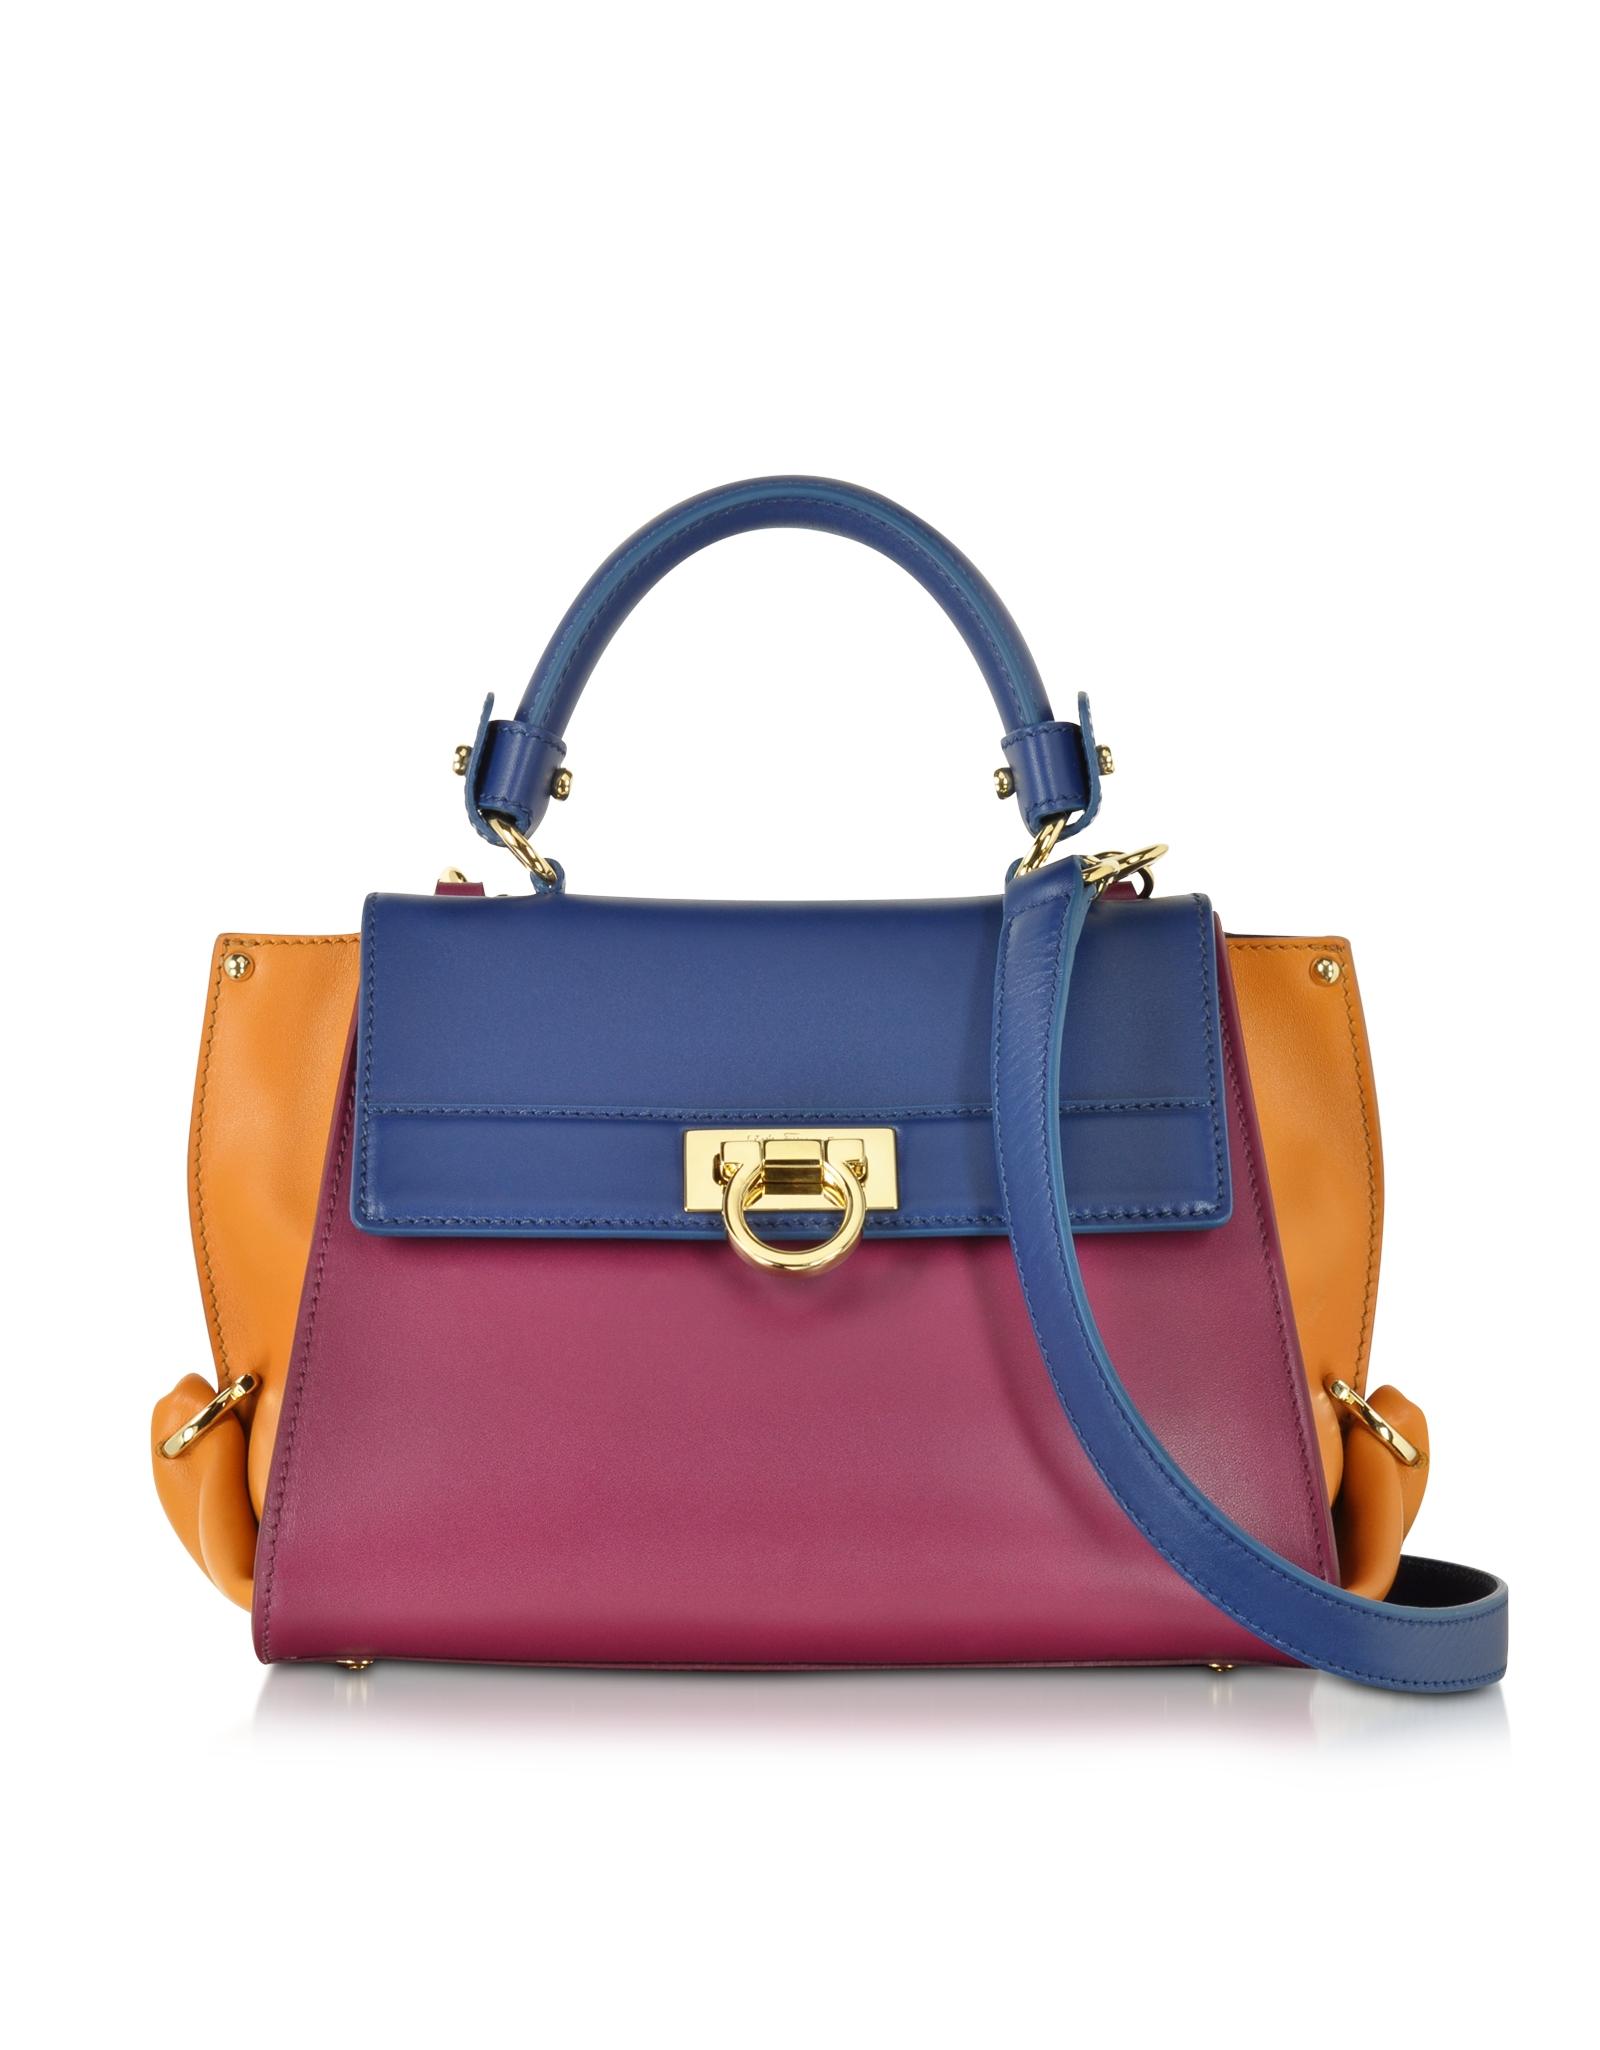 Ferragamo Small Sofia Color Block Leather Shoulder Bag in Metallic ... 04599771b76af